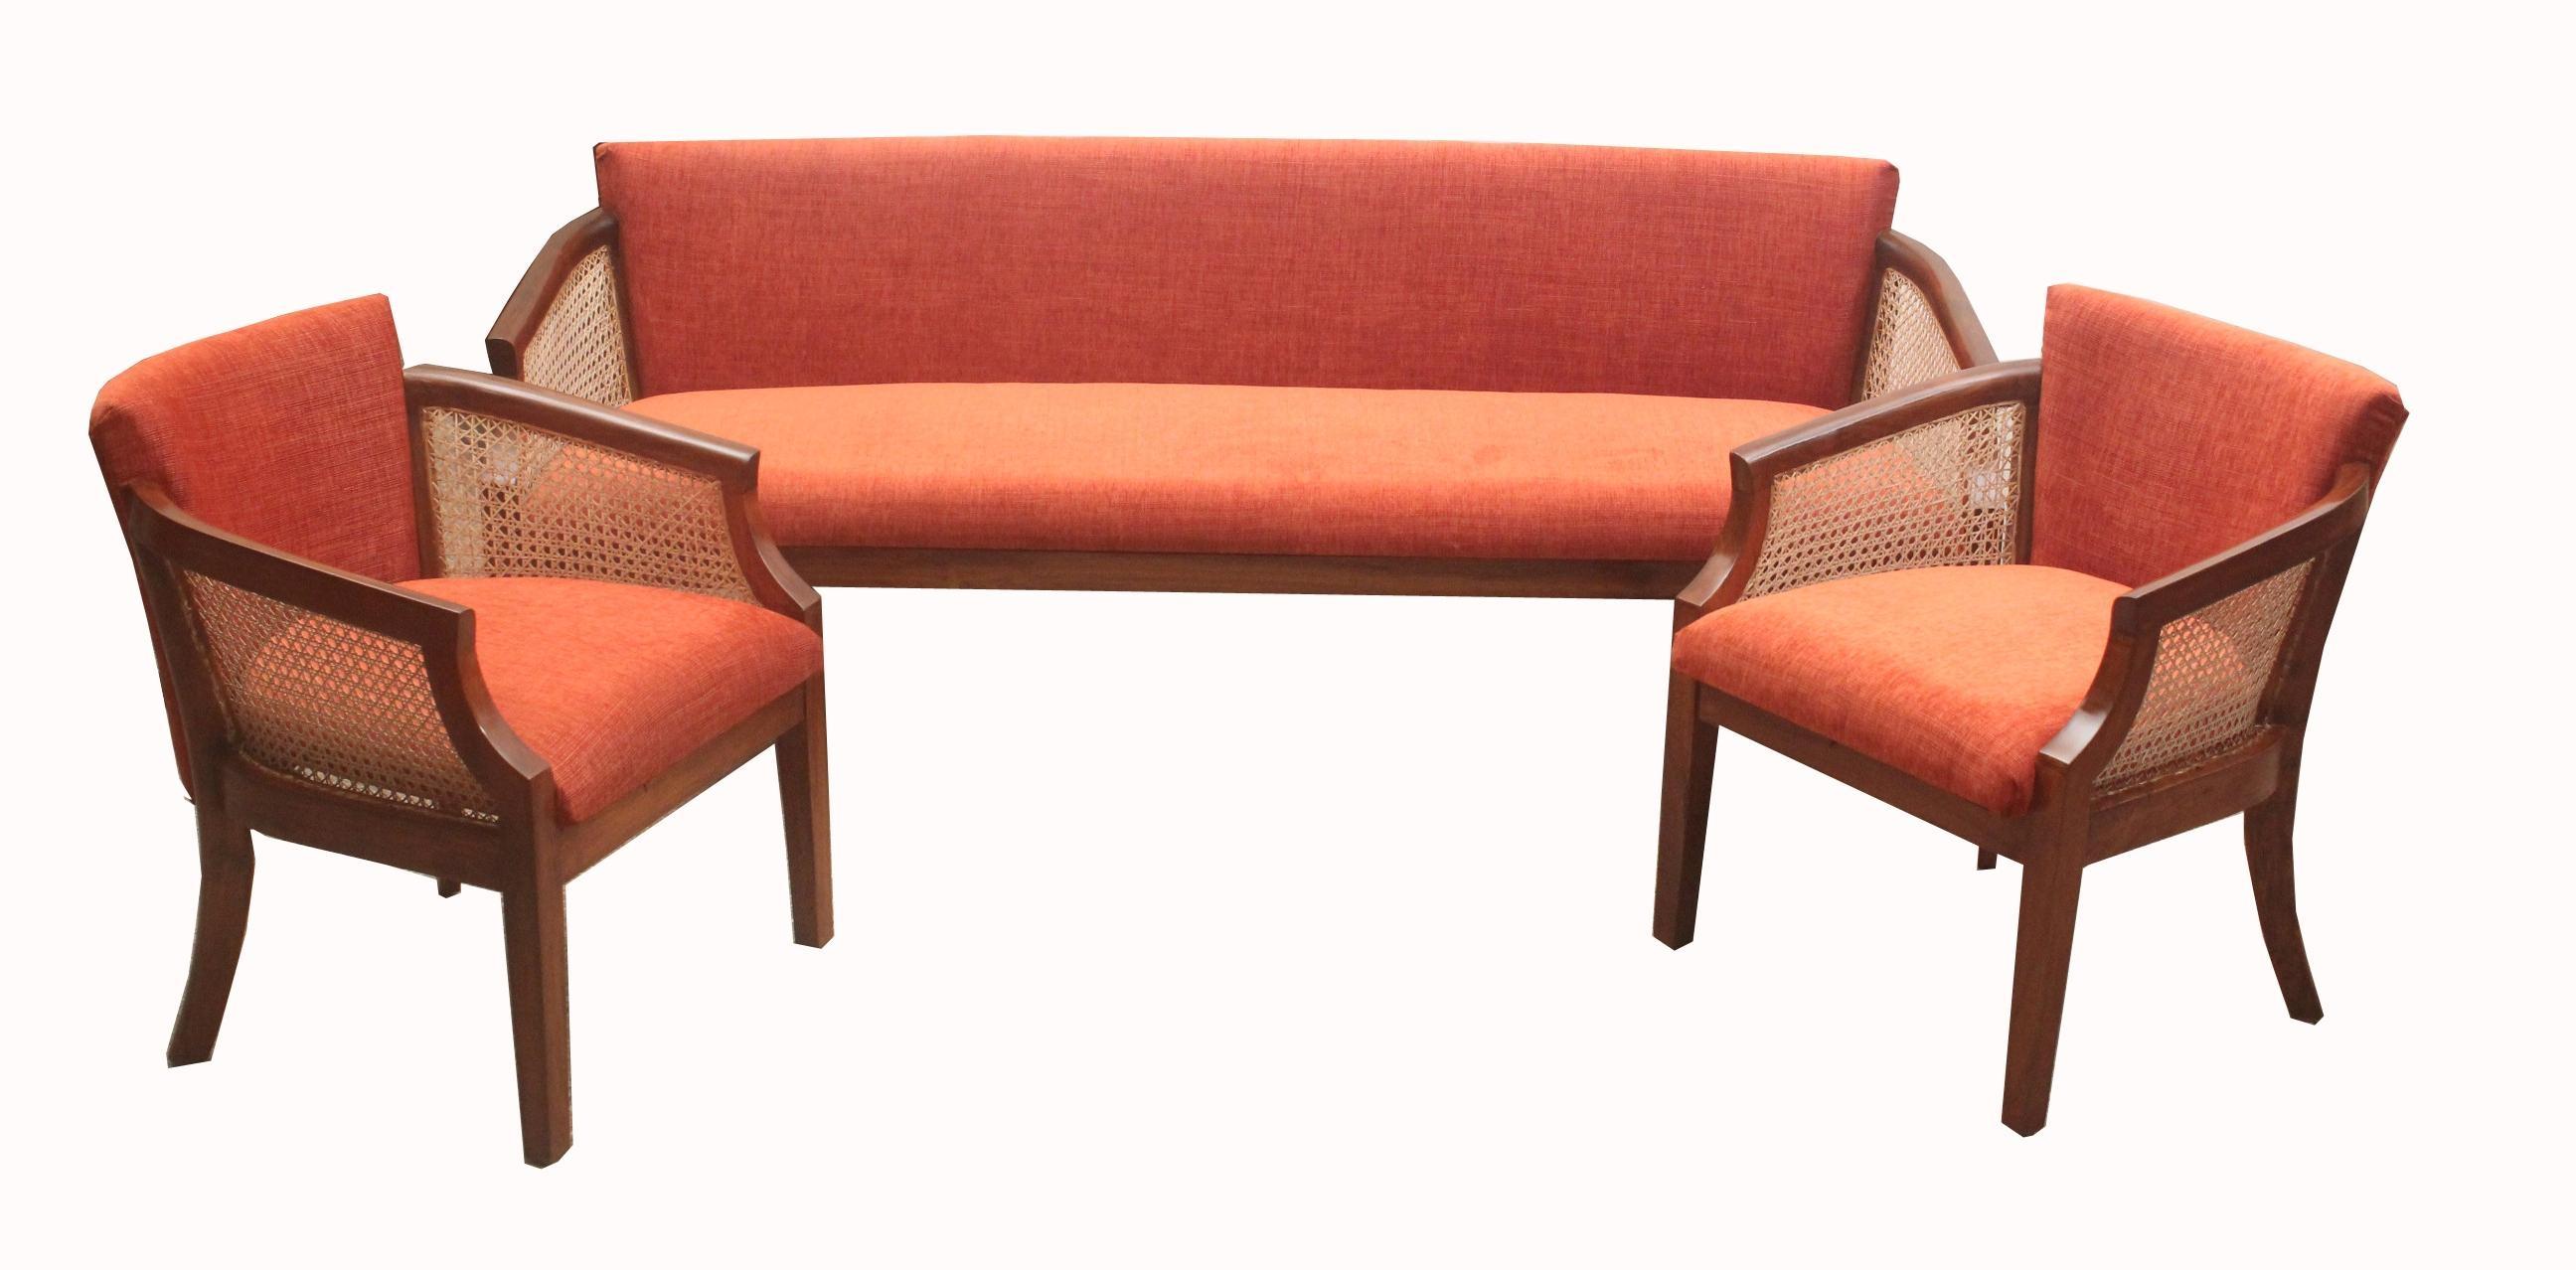 Cane Sofa Set With Inspiration Design 46956 | Kengire Throughout Ken Sofa Sets (Image 13 of 20)